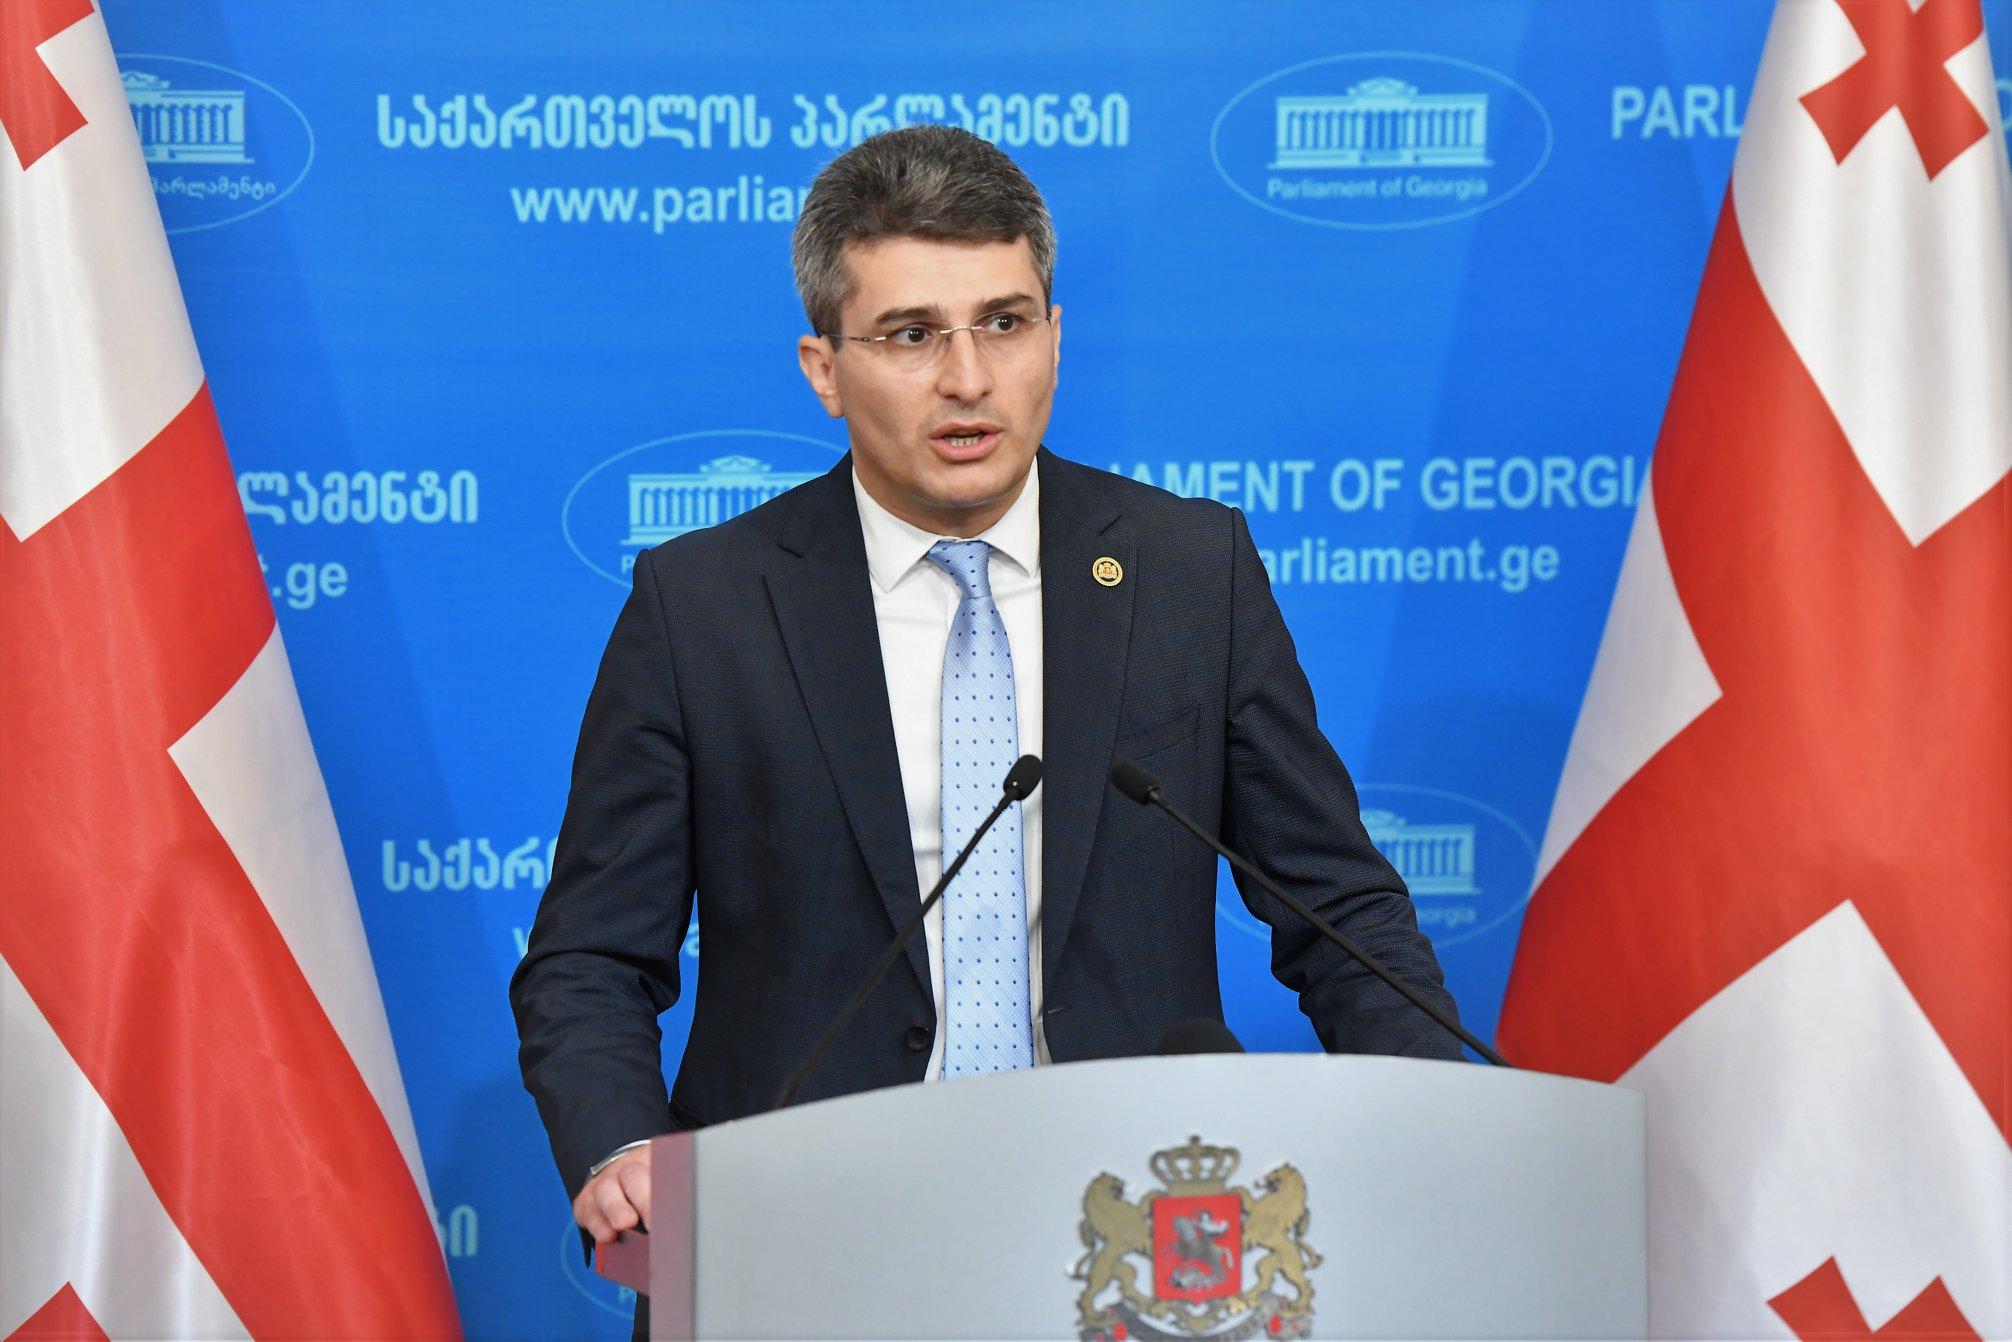 Mamuka Mdinaradze 5 #новости Грузинская мечта, ес, кризис Мечты, Мамука Мдинарадзе